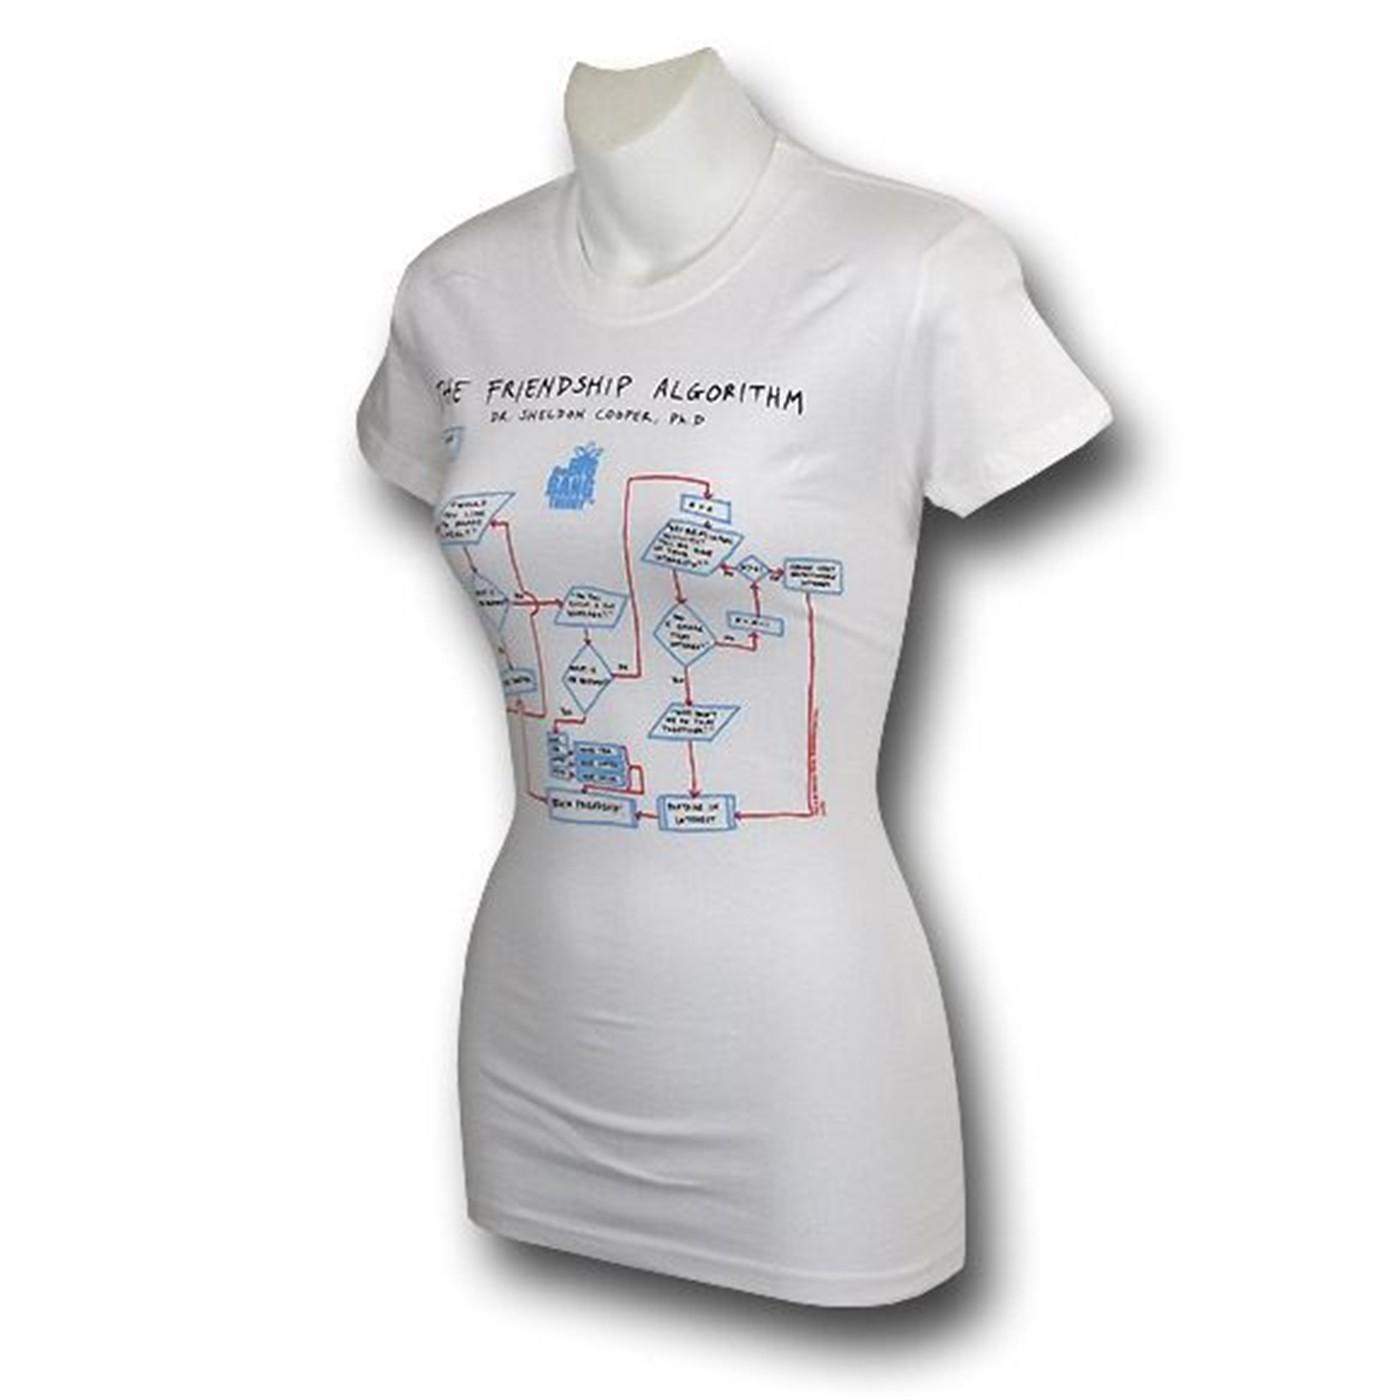 Big Bang Theory Friendship Algorithm Women's T-Shirt